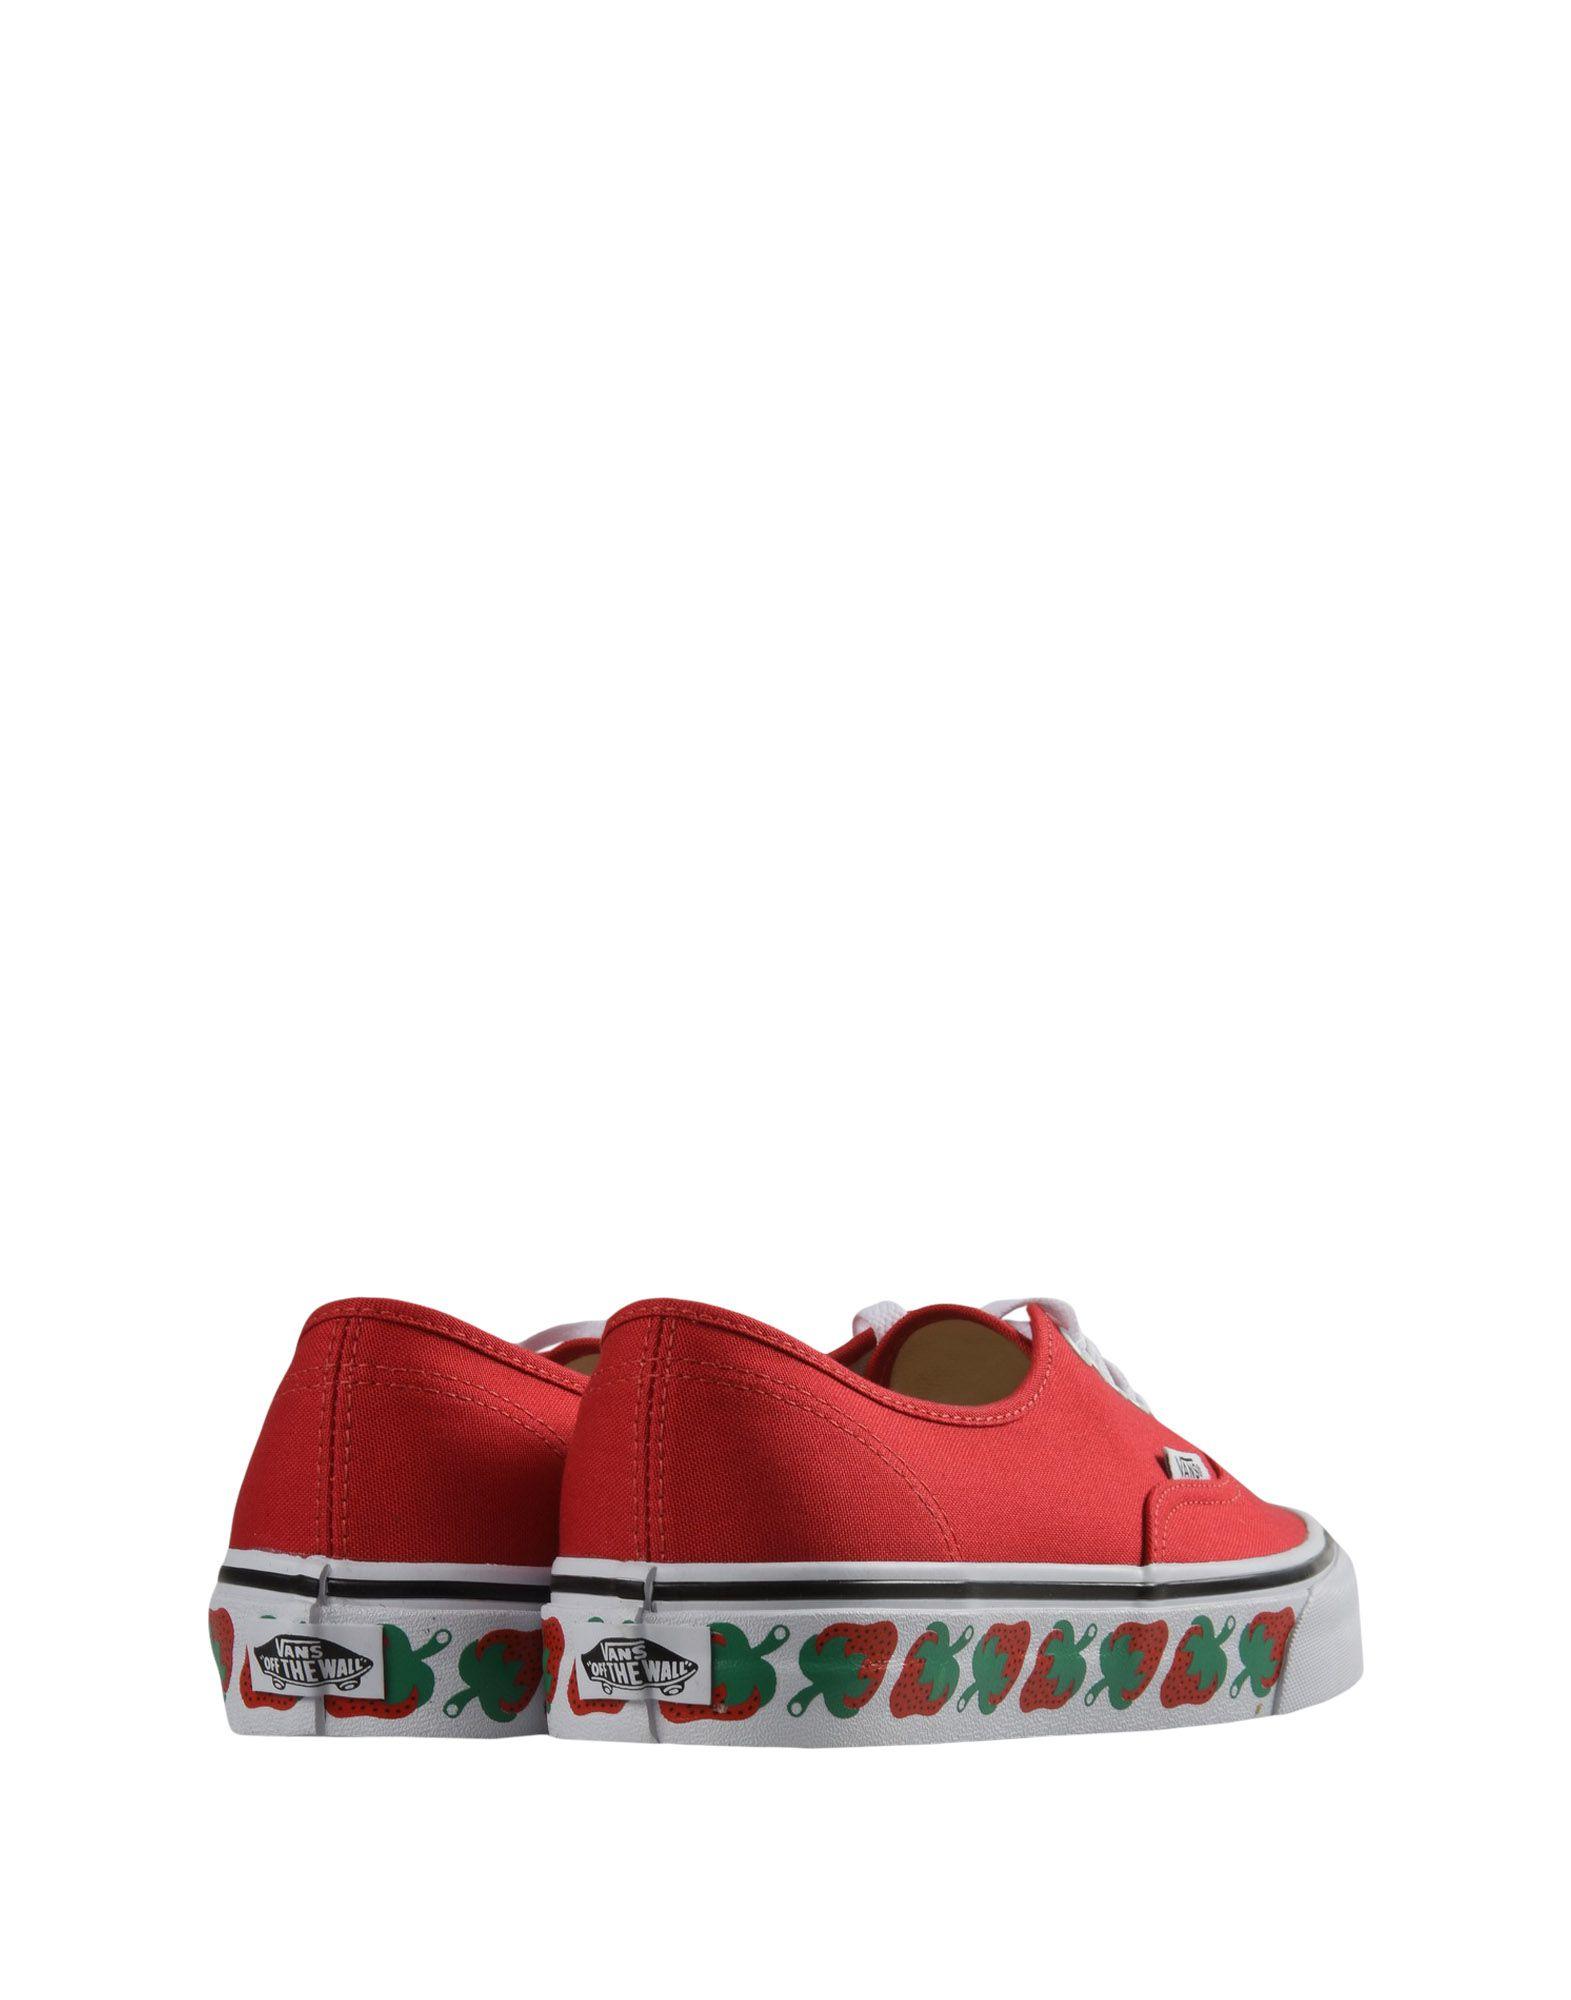 Vans Ua Ua Ua Authentic - Strawberry Tape - Sneakers - Women Vans Sneakers online on  United Kingdom - 11231891OE 04bebc